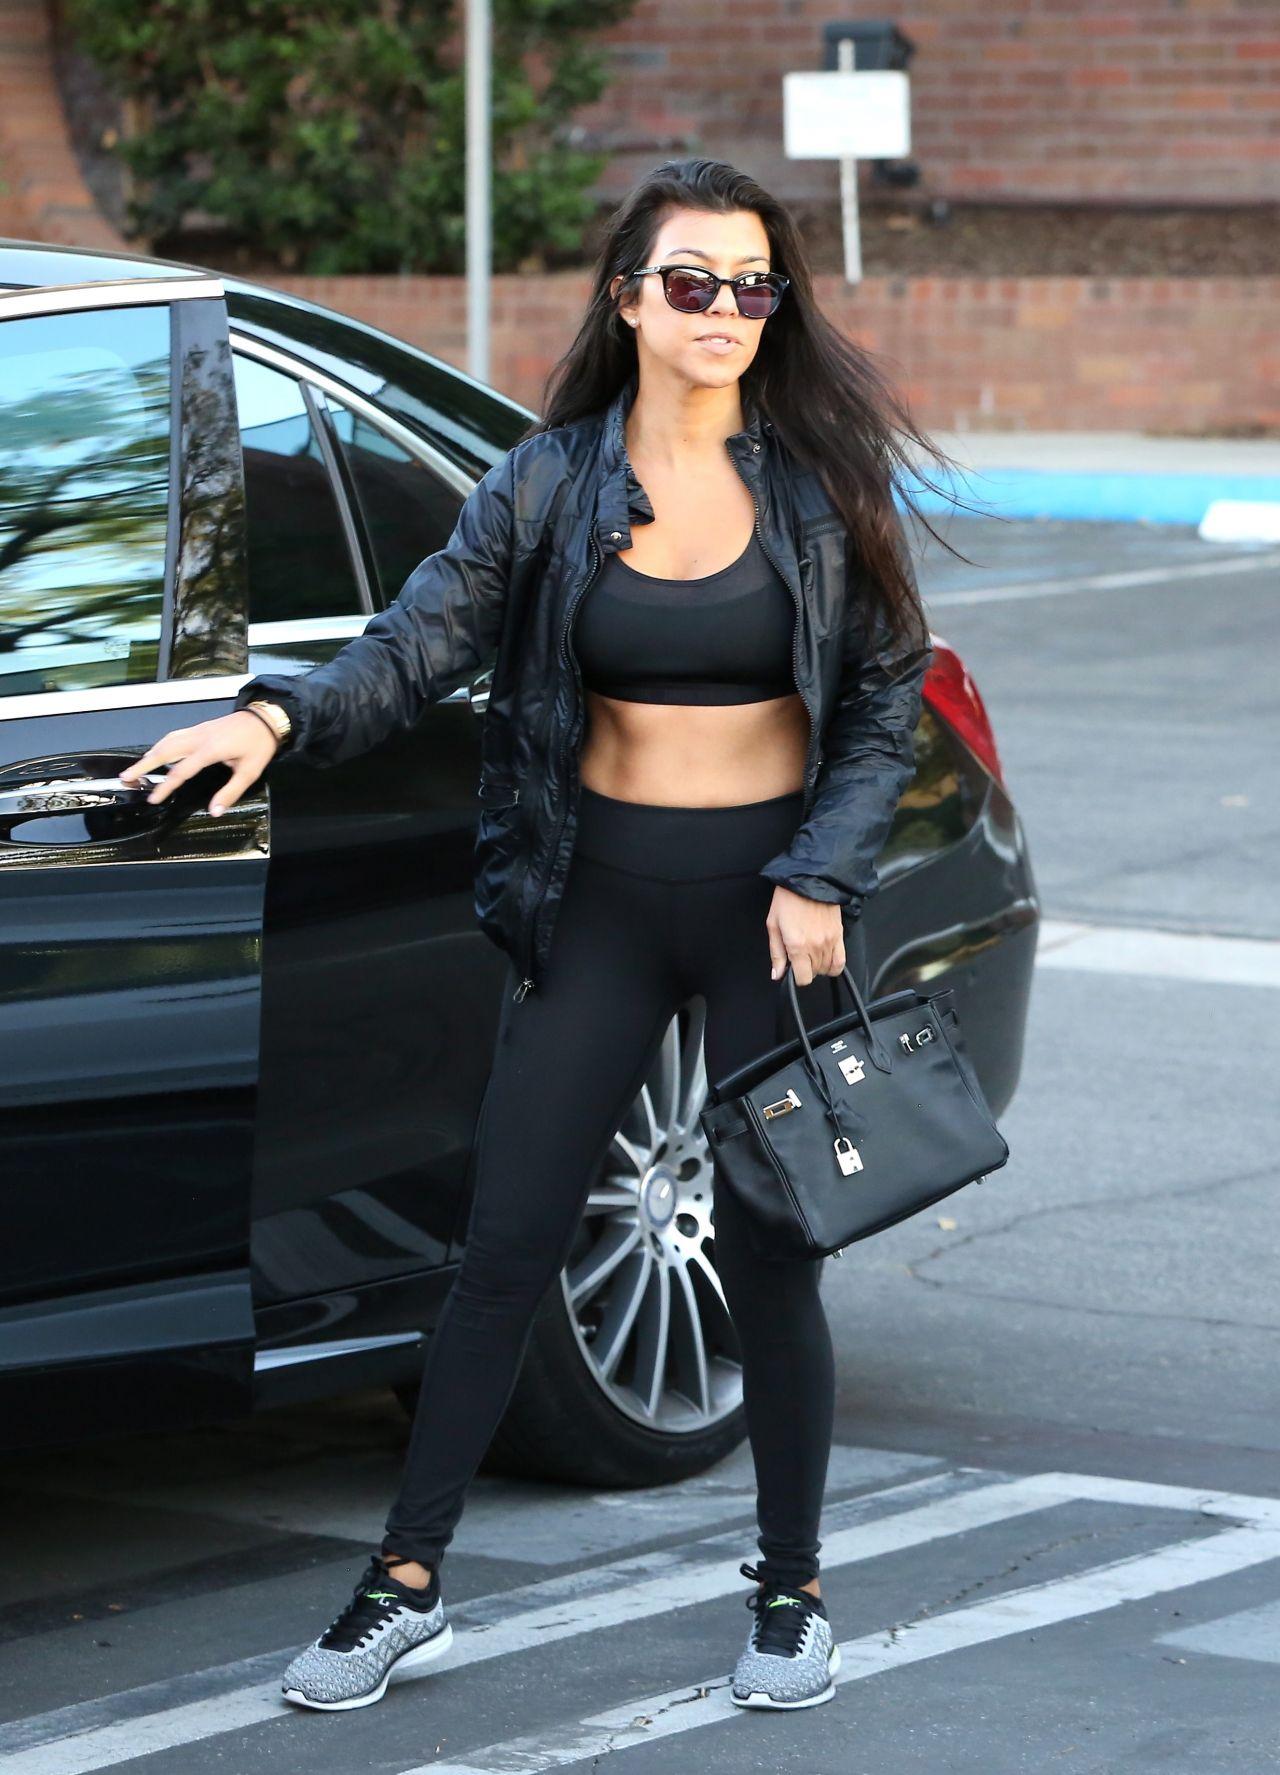 Kourtney Kardashian In A Black Sports Bra And Leggings